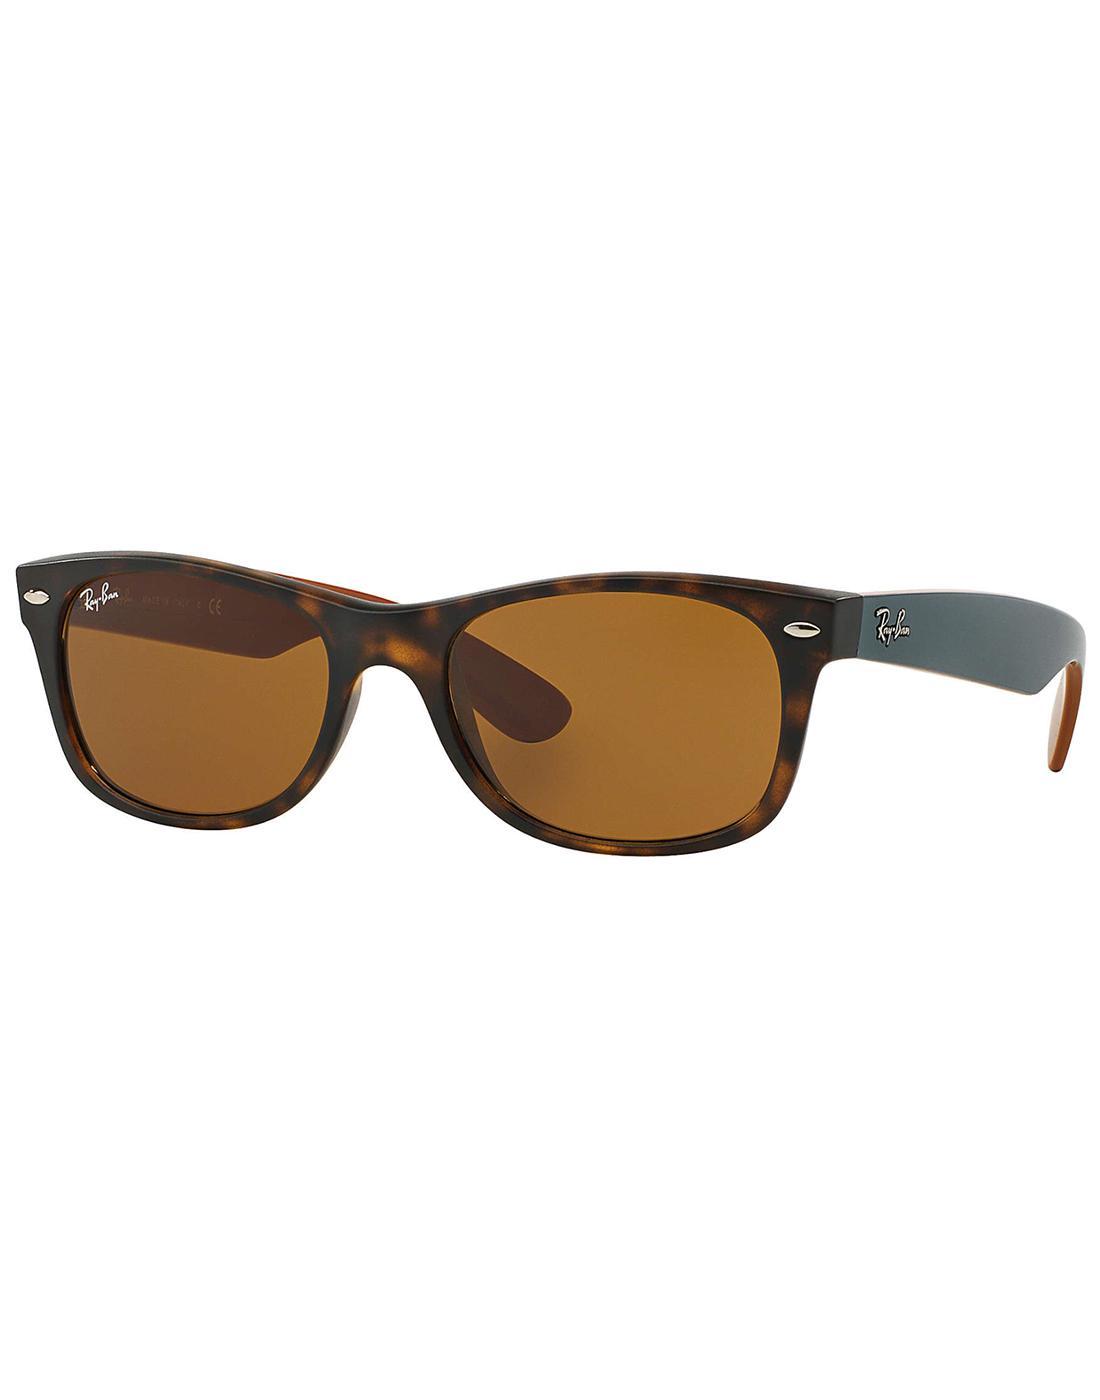 New Wayfarer RAY-BAN Retro Sunglasses -Brown/Green